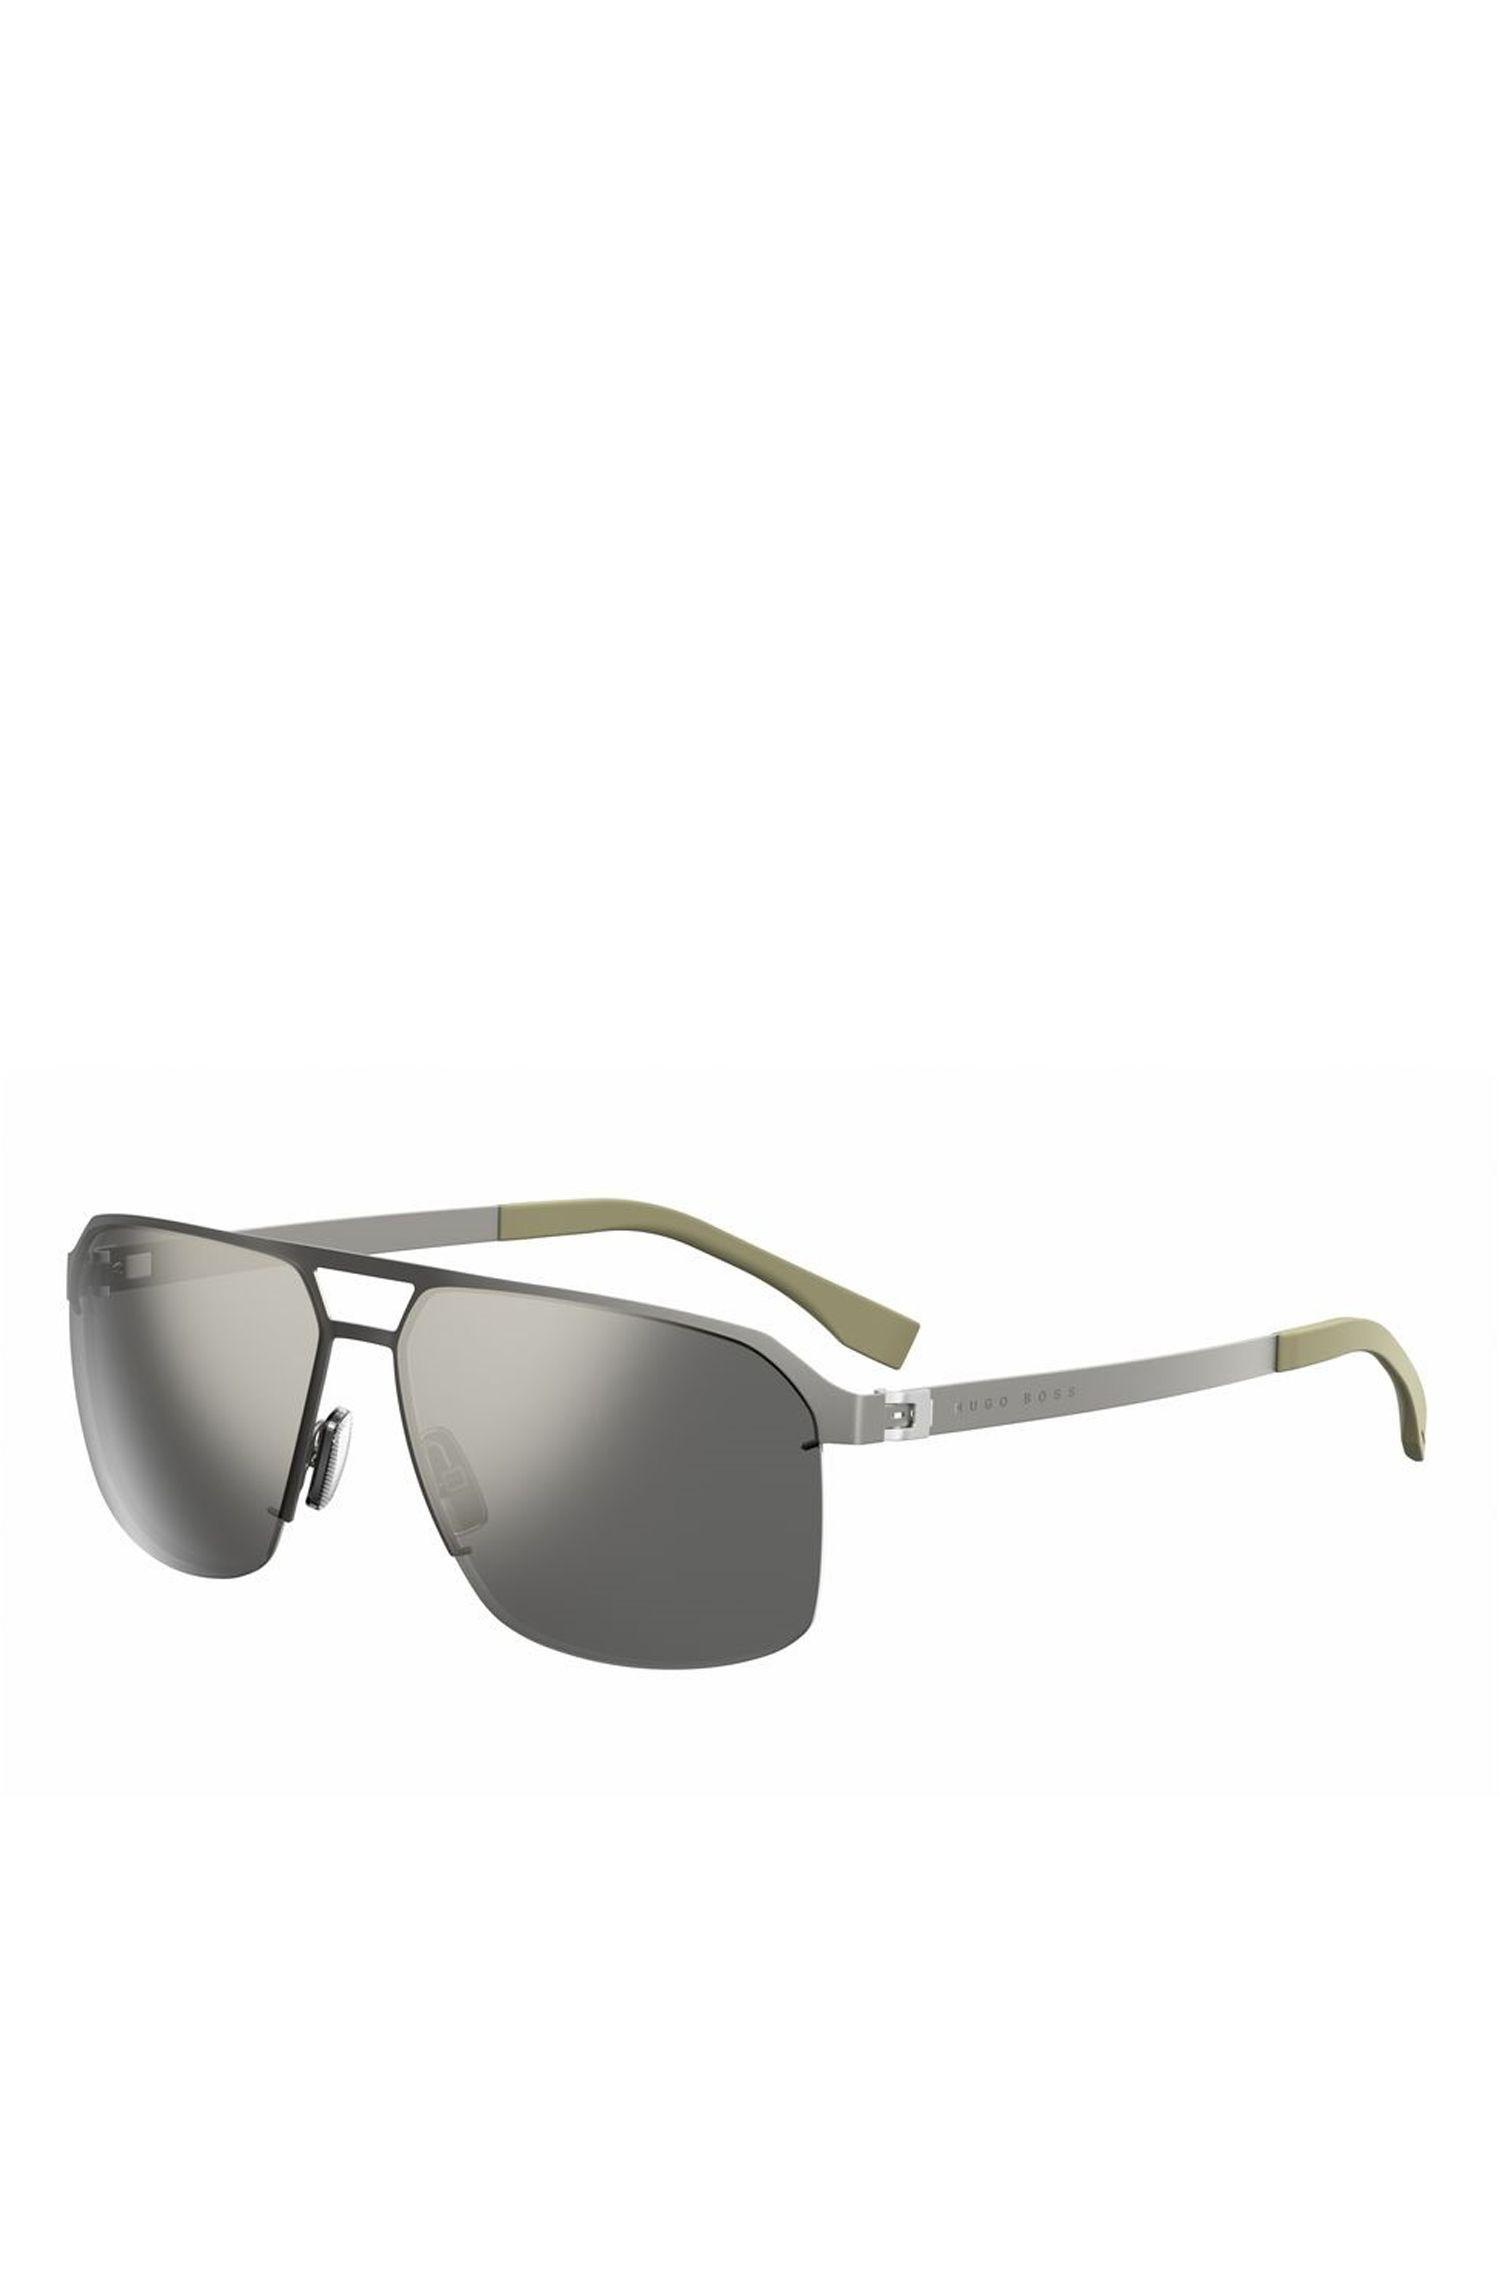 'BOSS 0839S' | Navigator Flat Metal Sunglasses